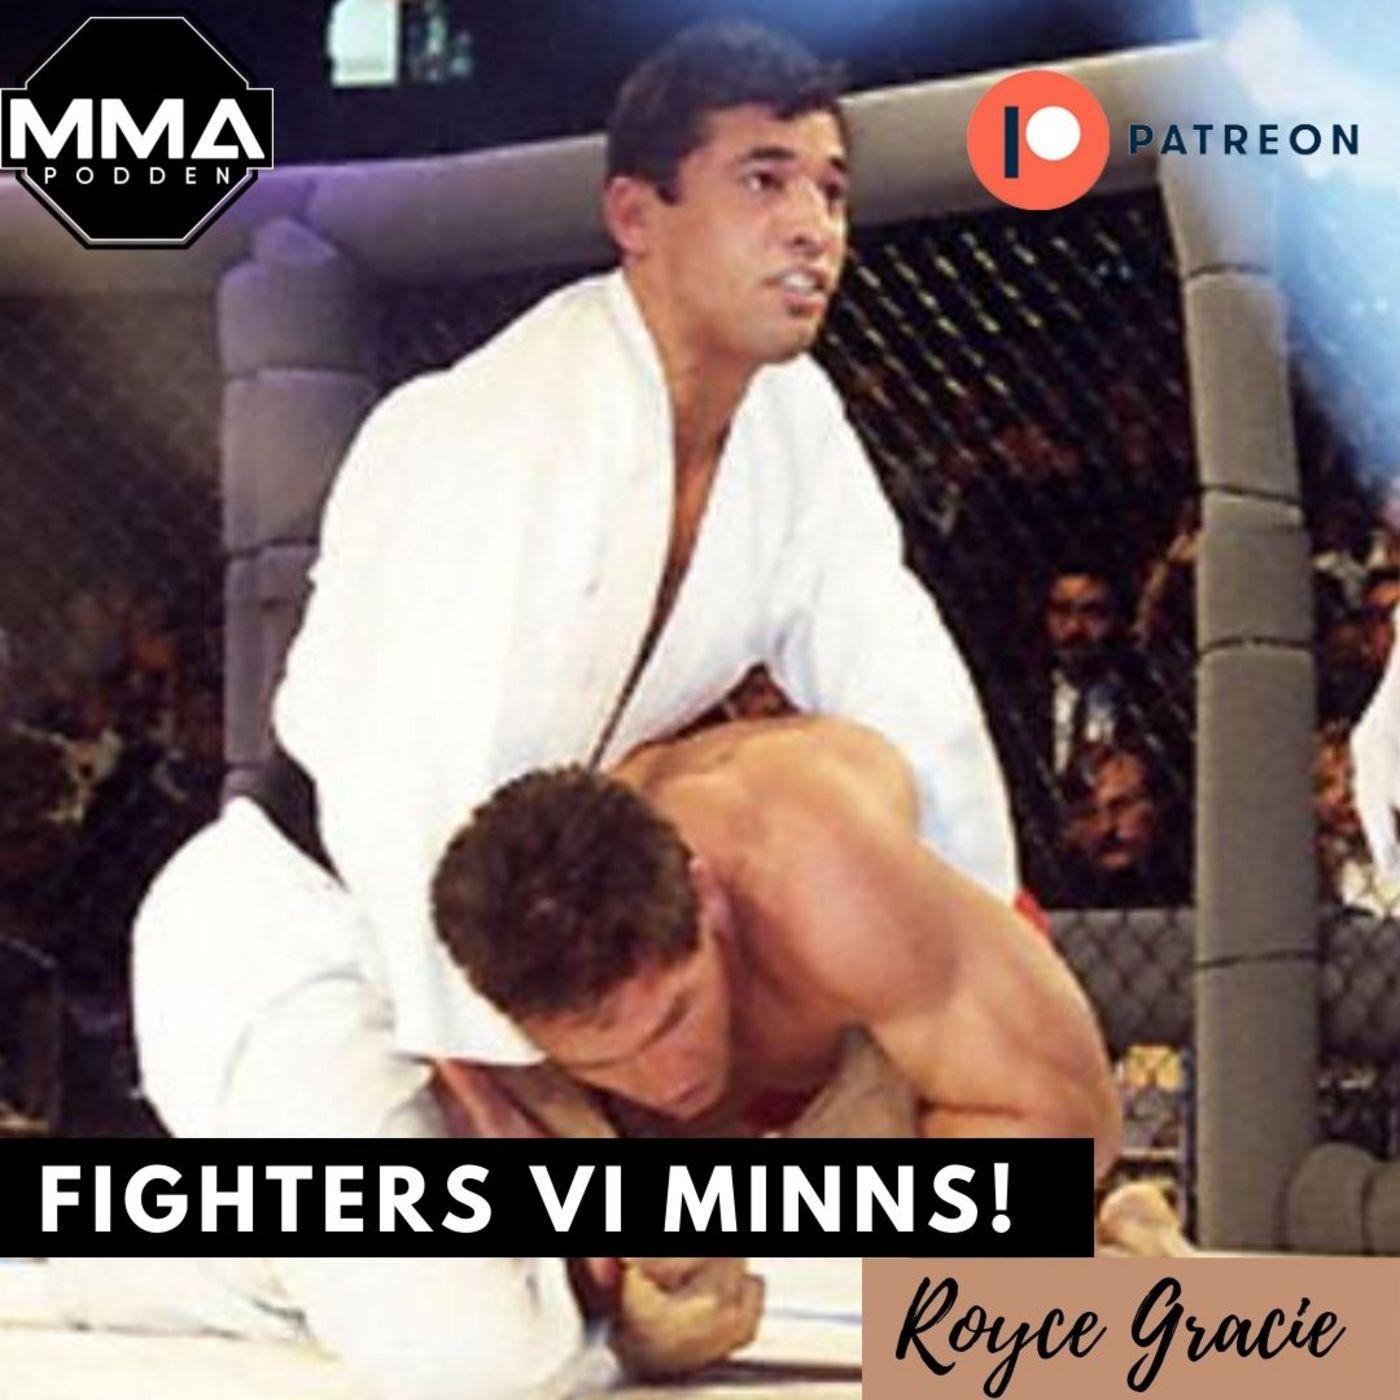 Fighters vi minns! Royce Gracie promo. Patreon exklusivt